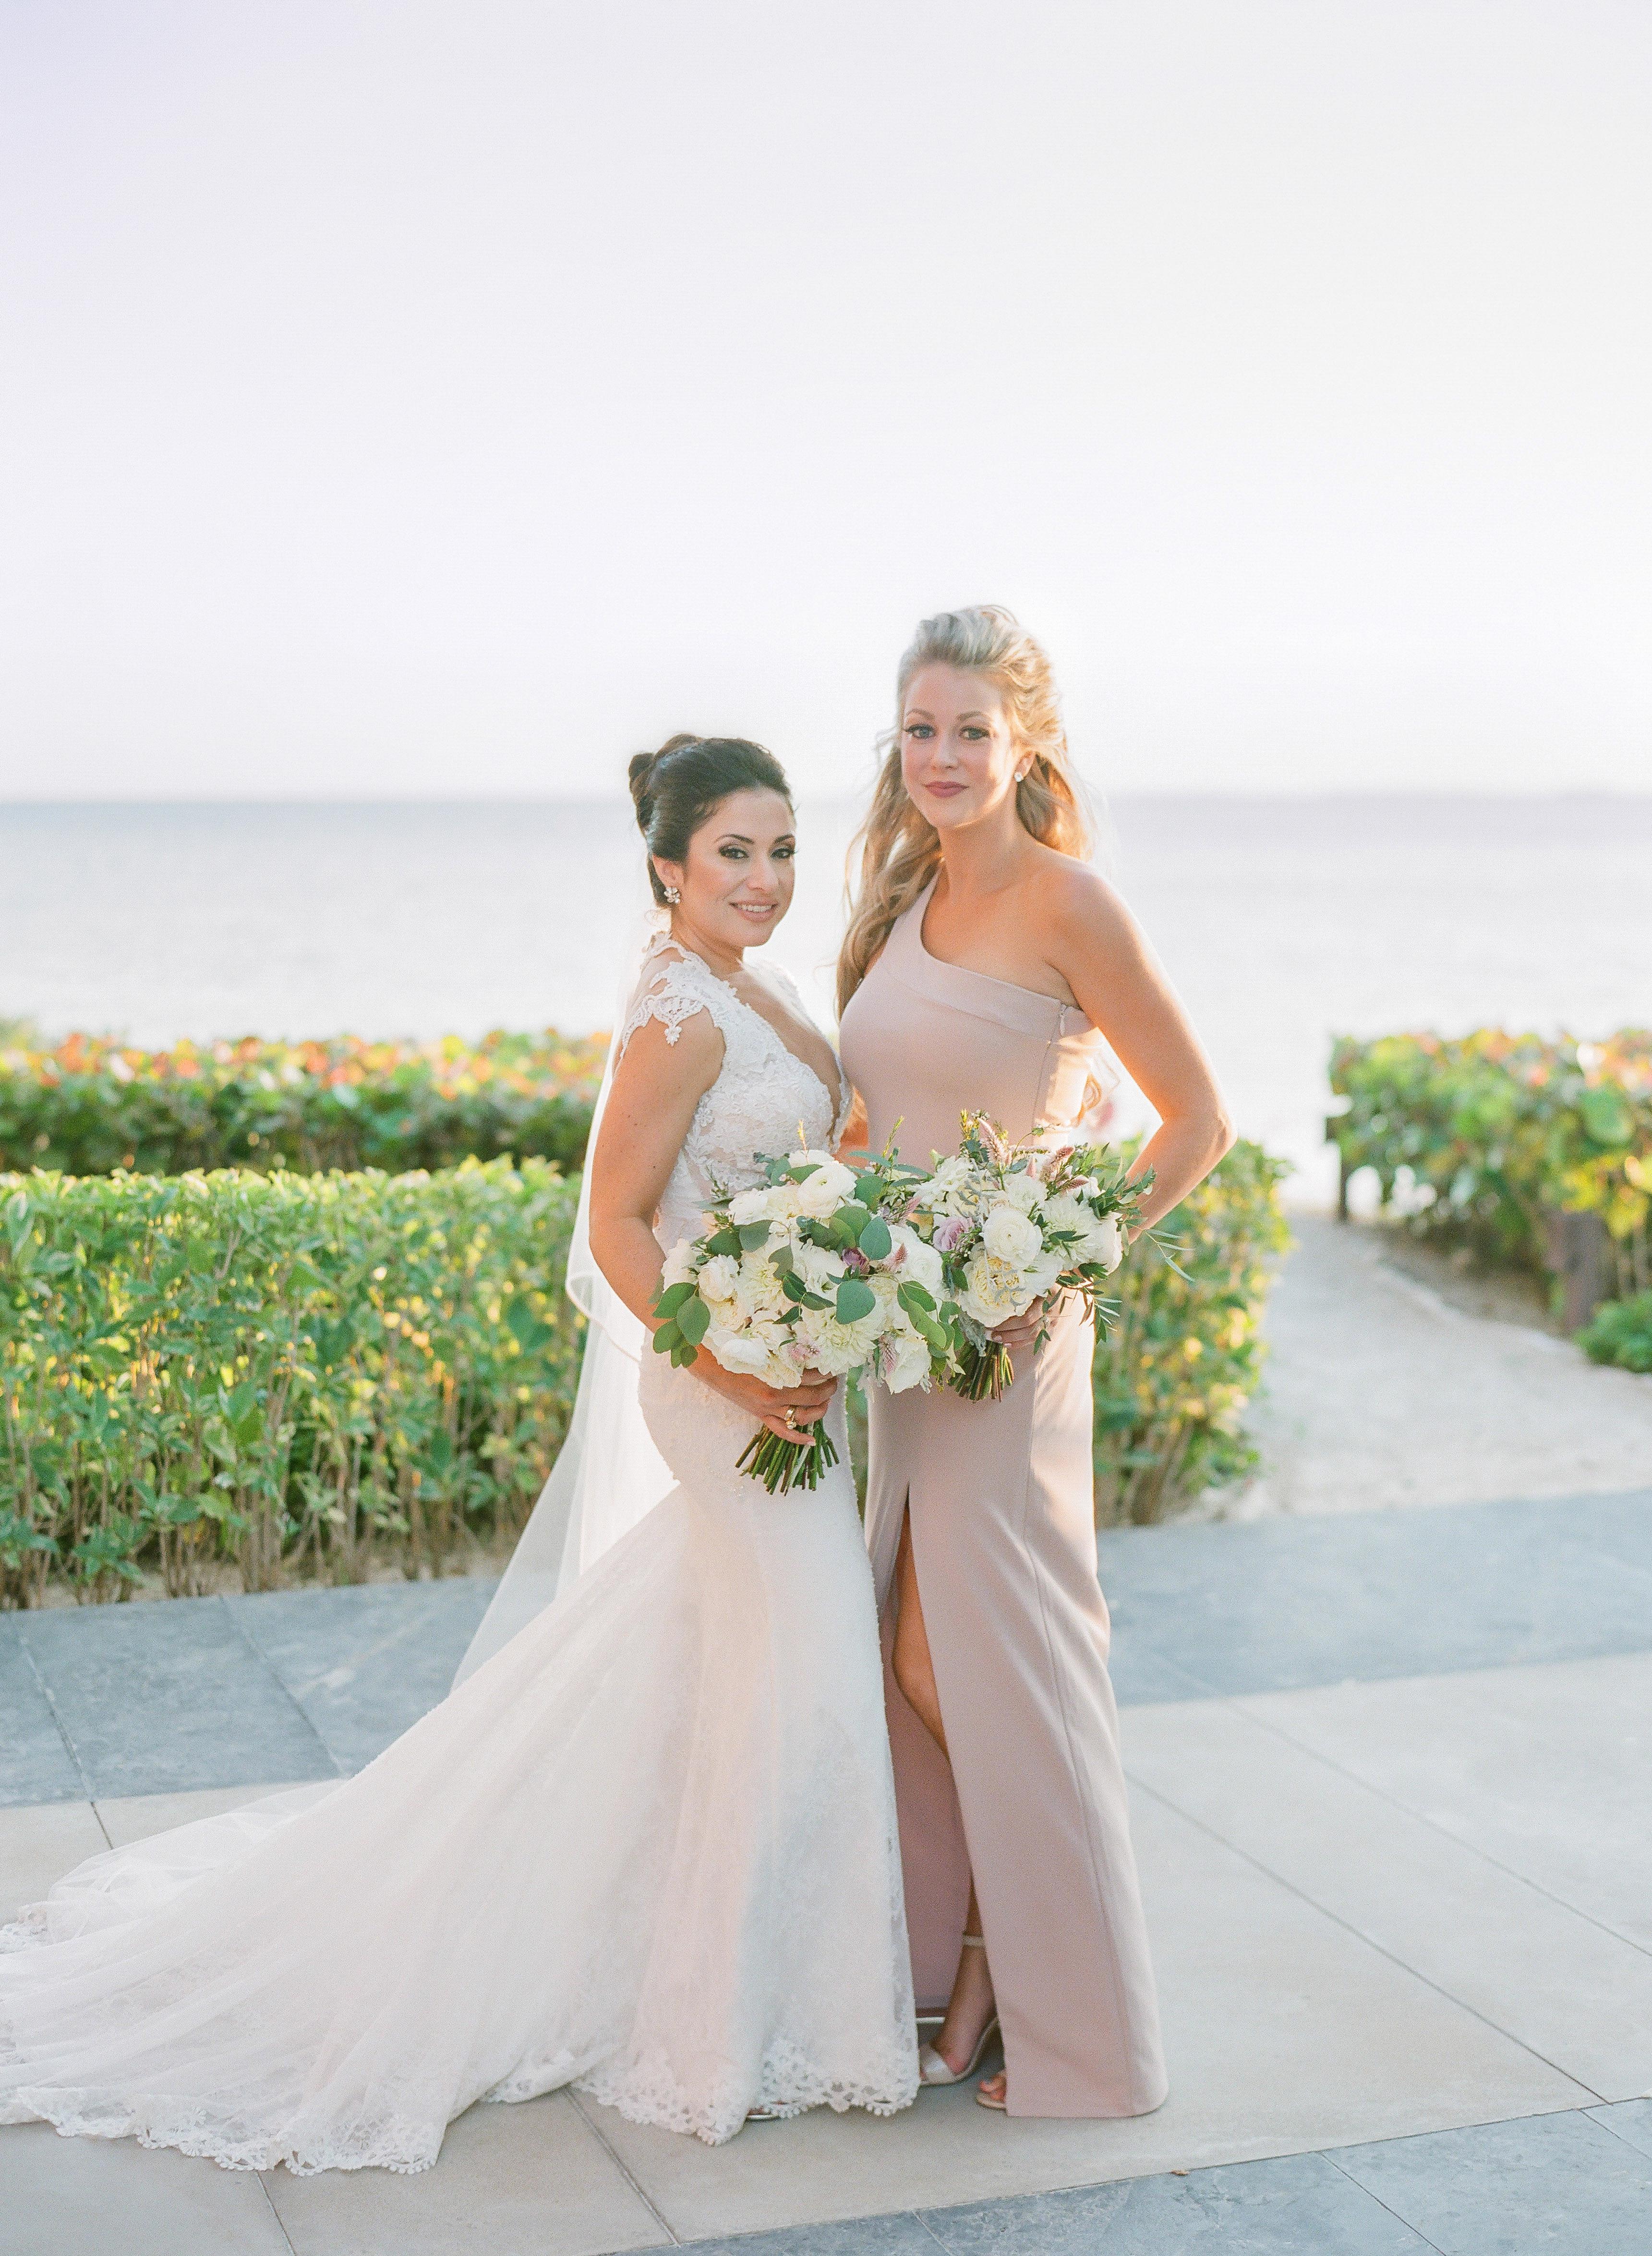 vicky james mexico wedding bride maid of honor